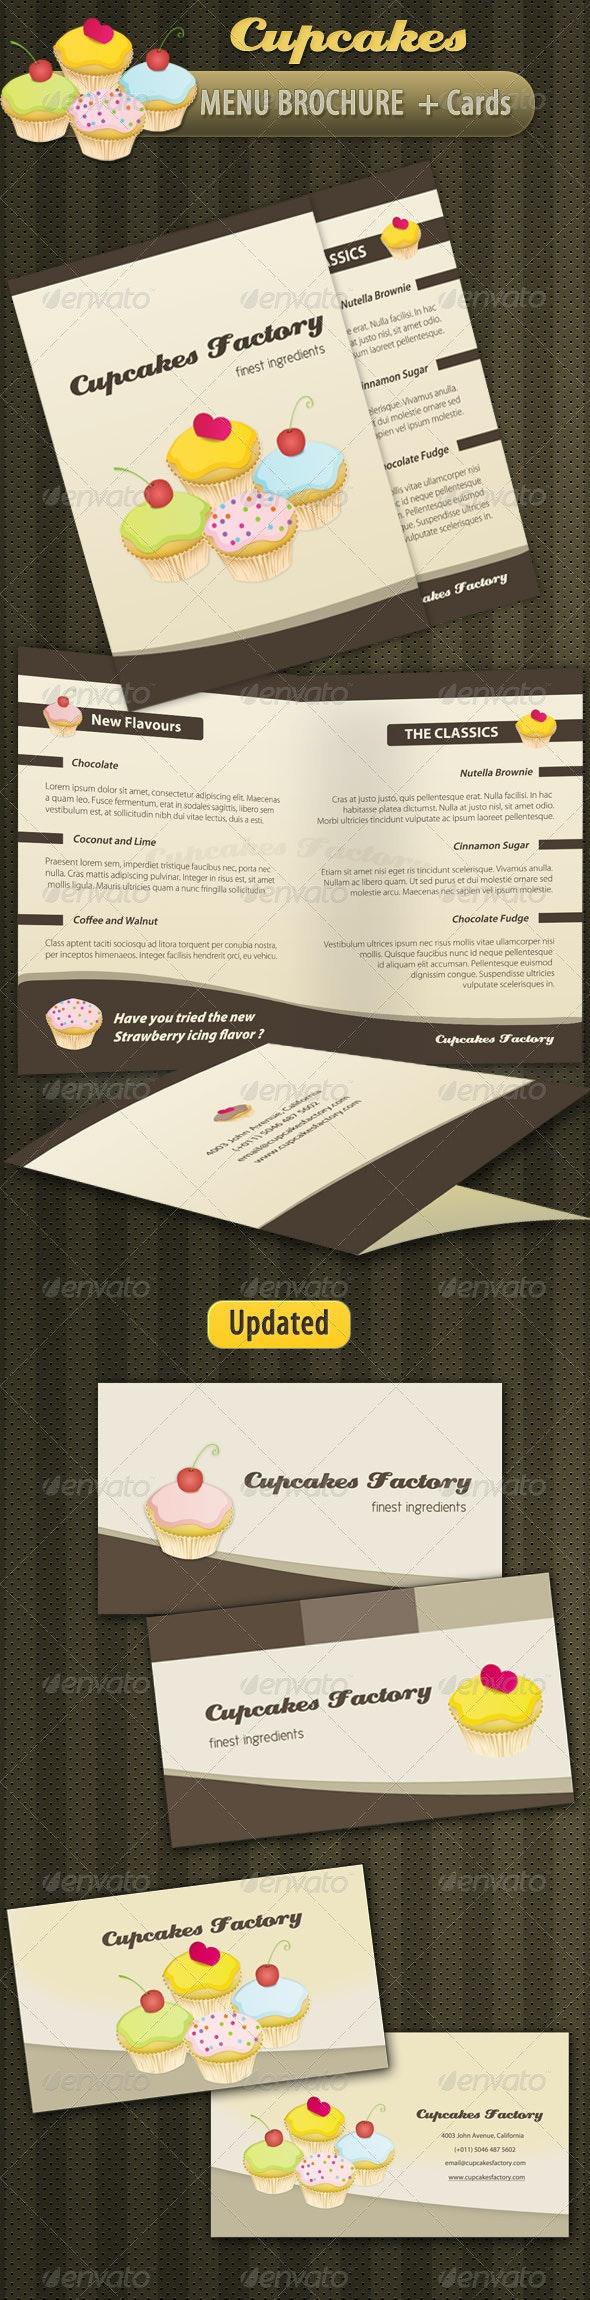 Cupcakes Bakery Menu Brochure + Cards - Food Menus Print Templates